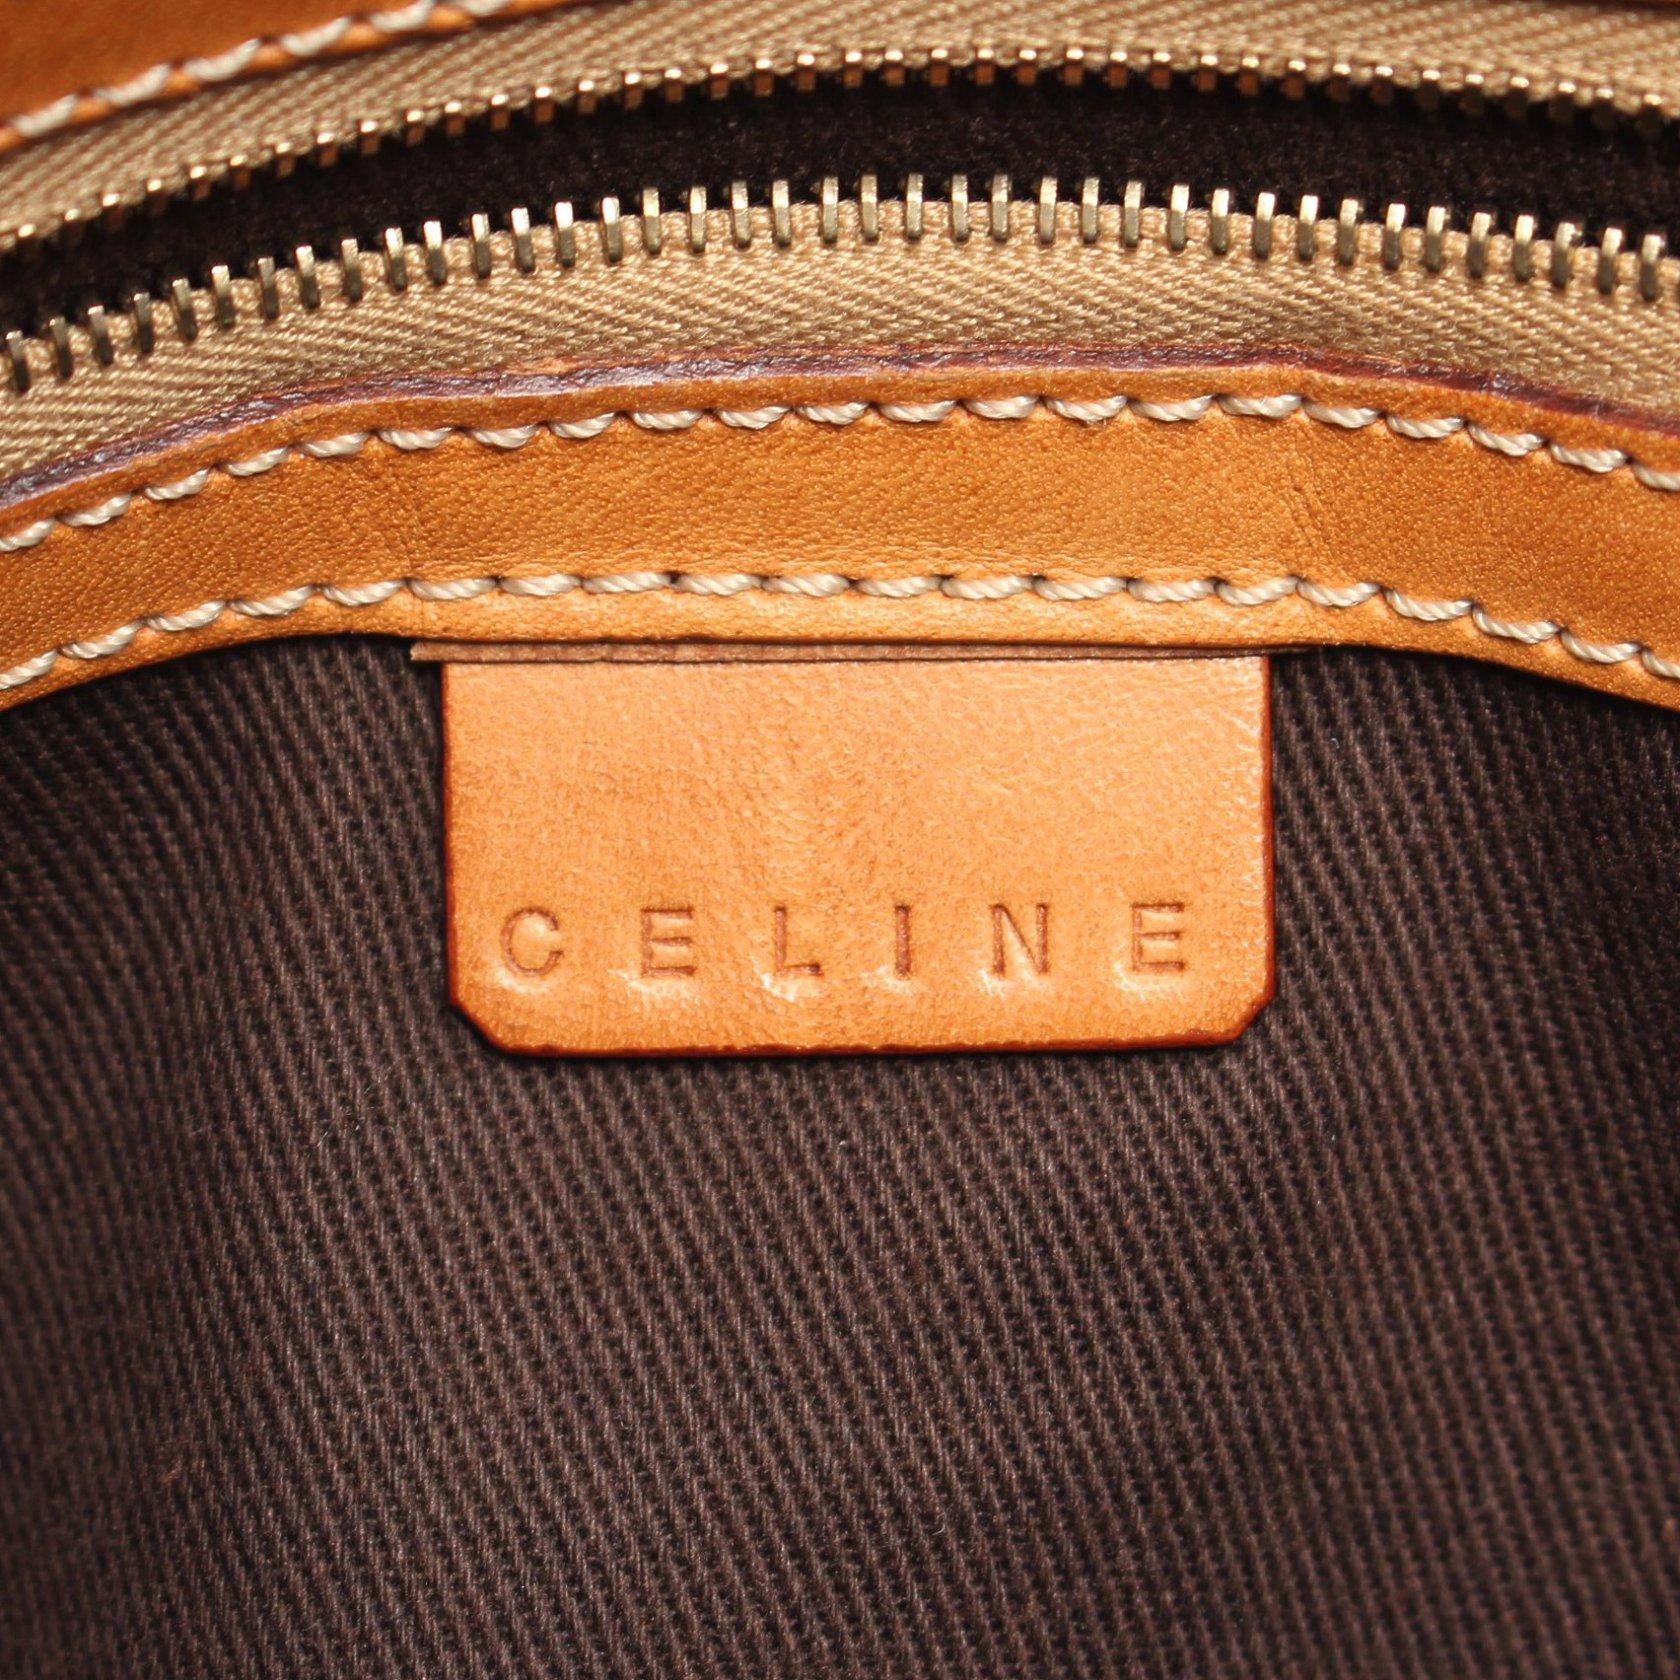 CELINE・バッグ・マカダム ハンドバッグ トートバッグ PVC レザー ダークブラウン ライトブラウン